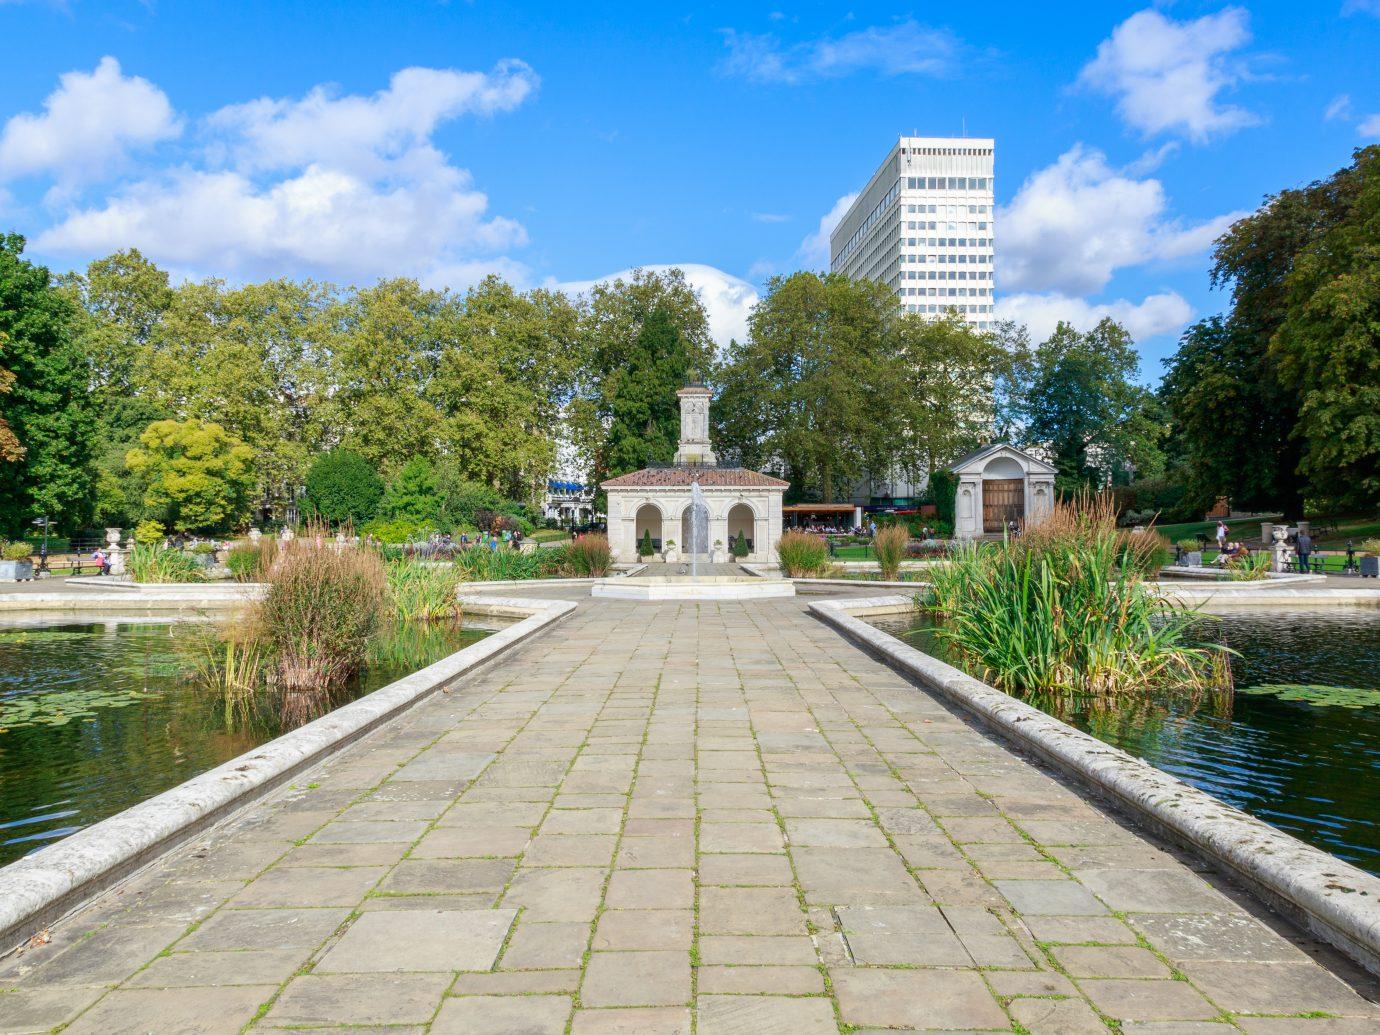 The Italian Gardens at Hyde Park, London